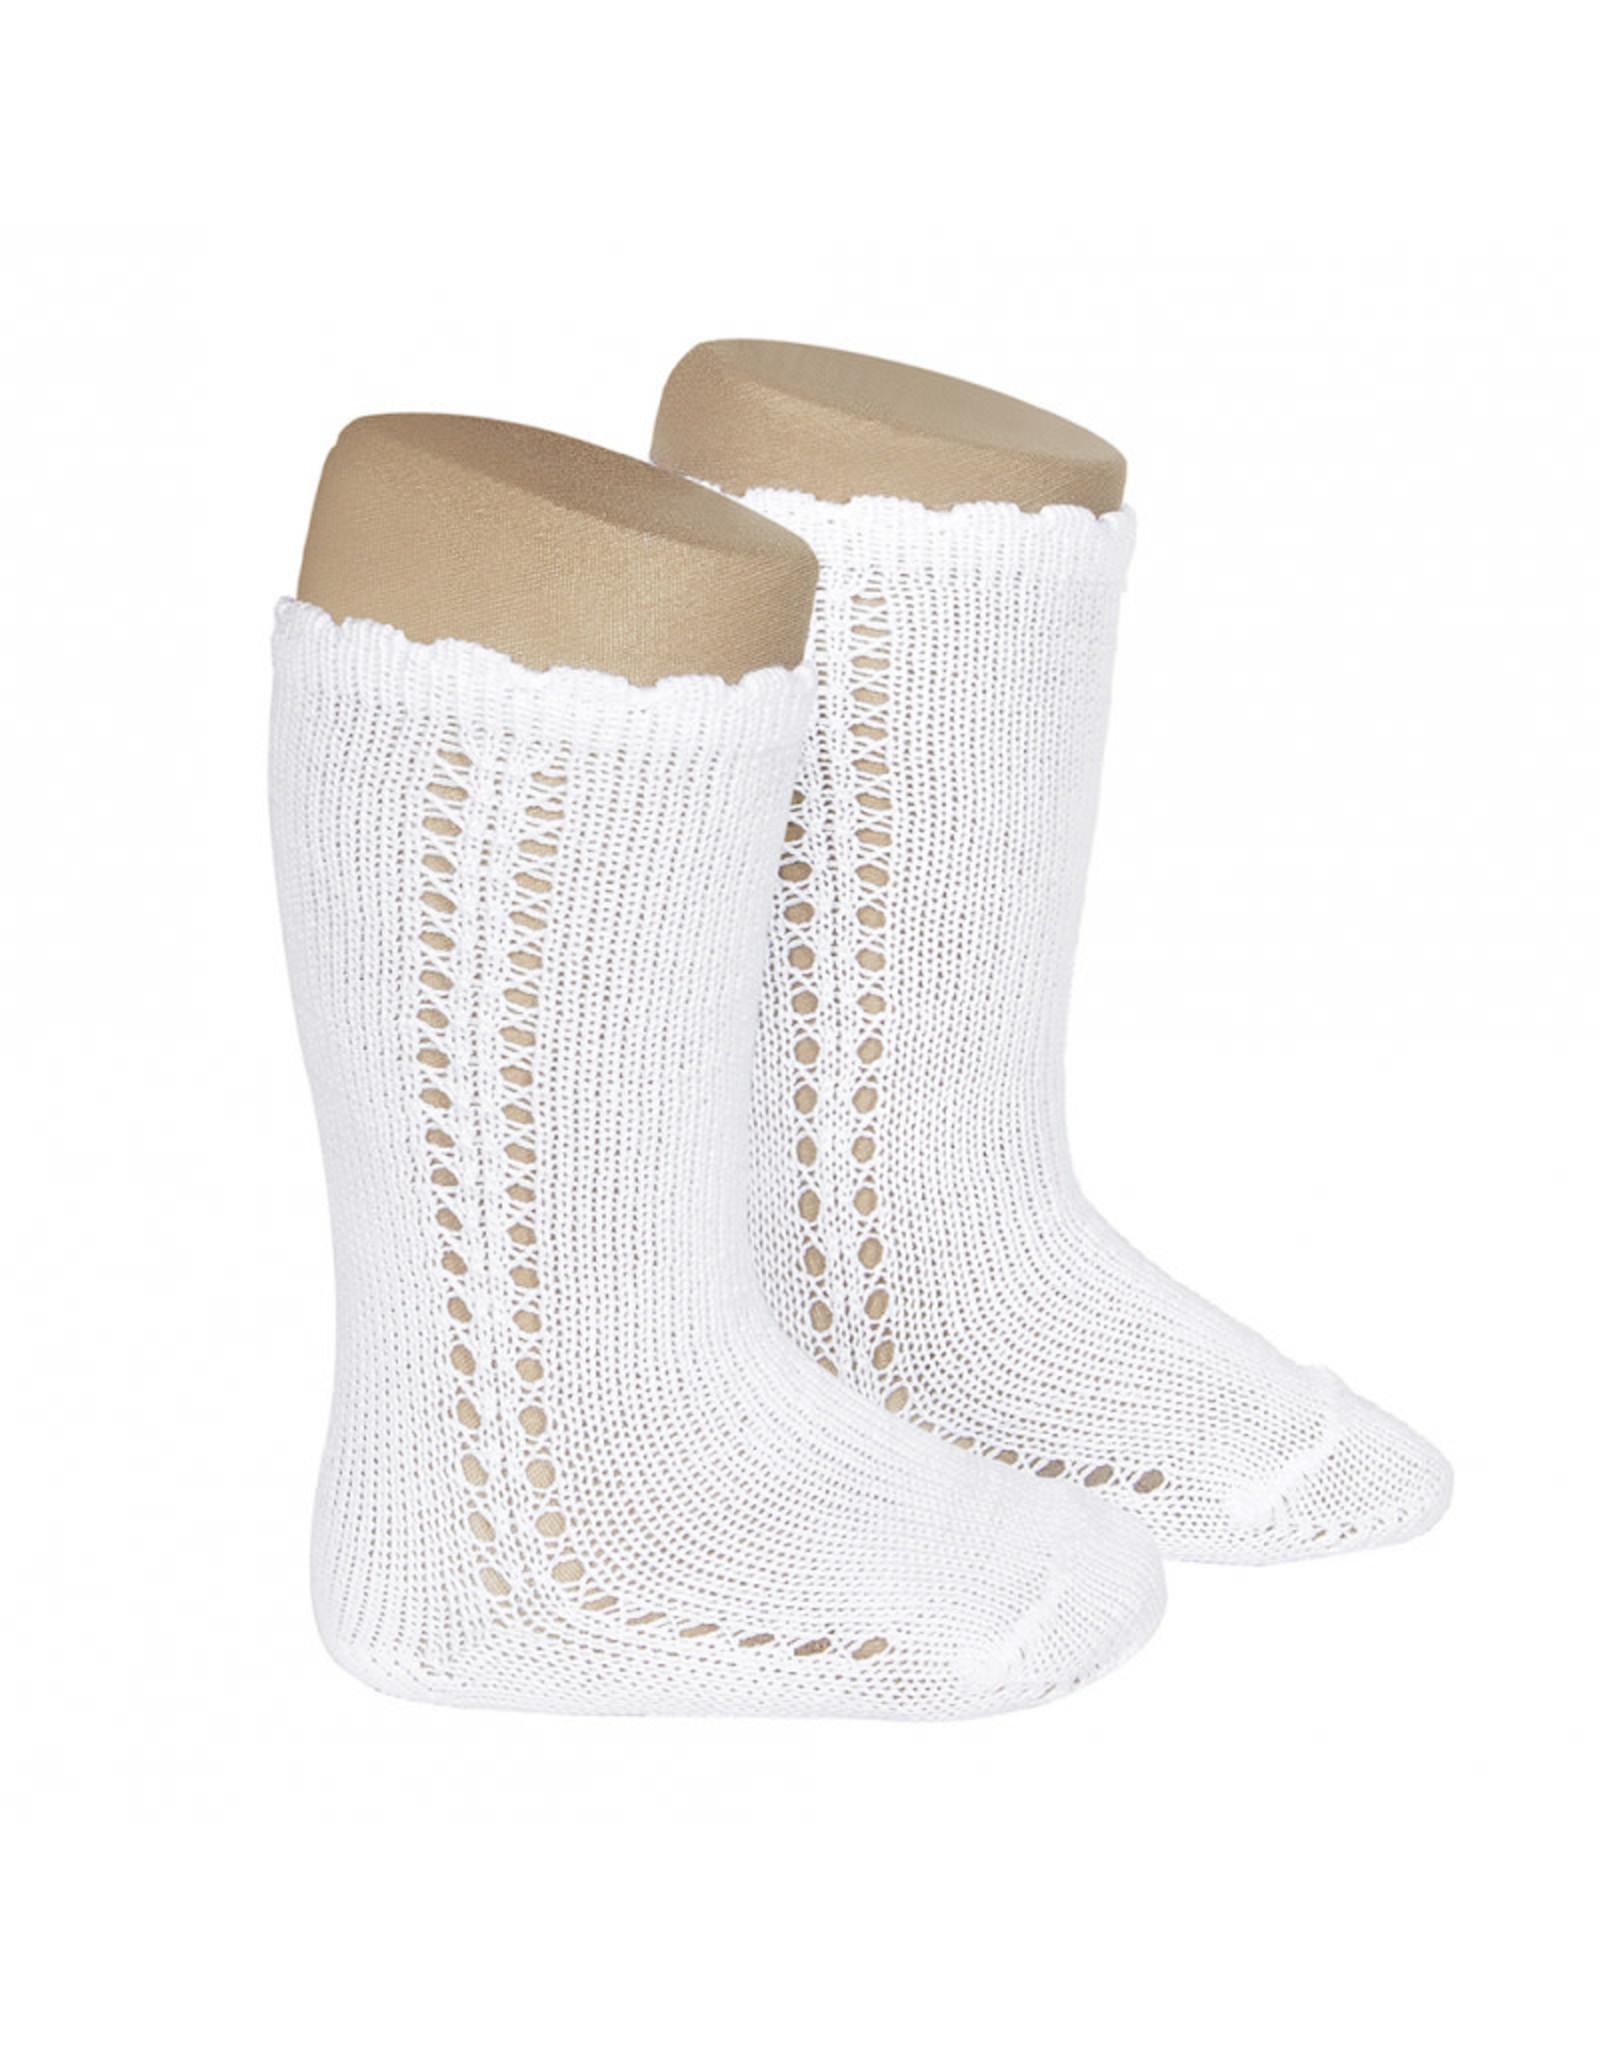 CONDOR White Side Openwork Socks